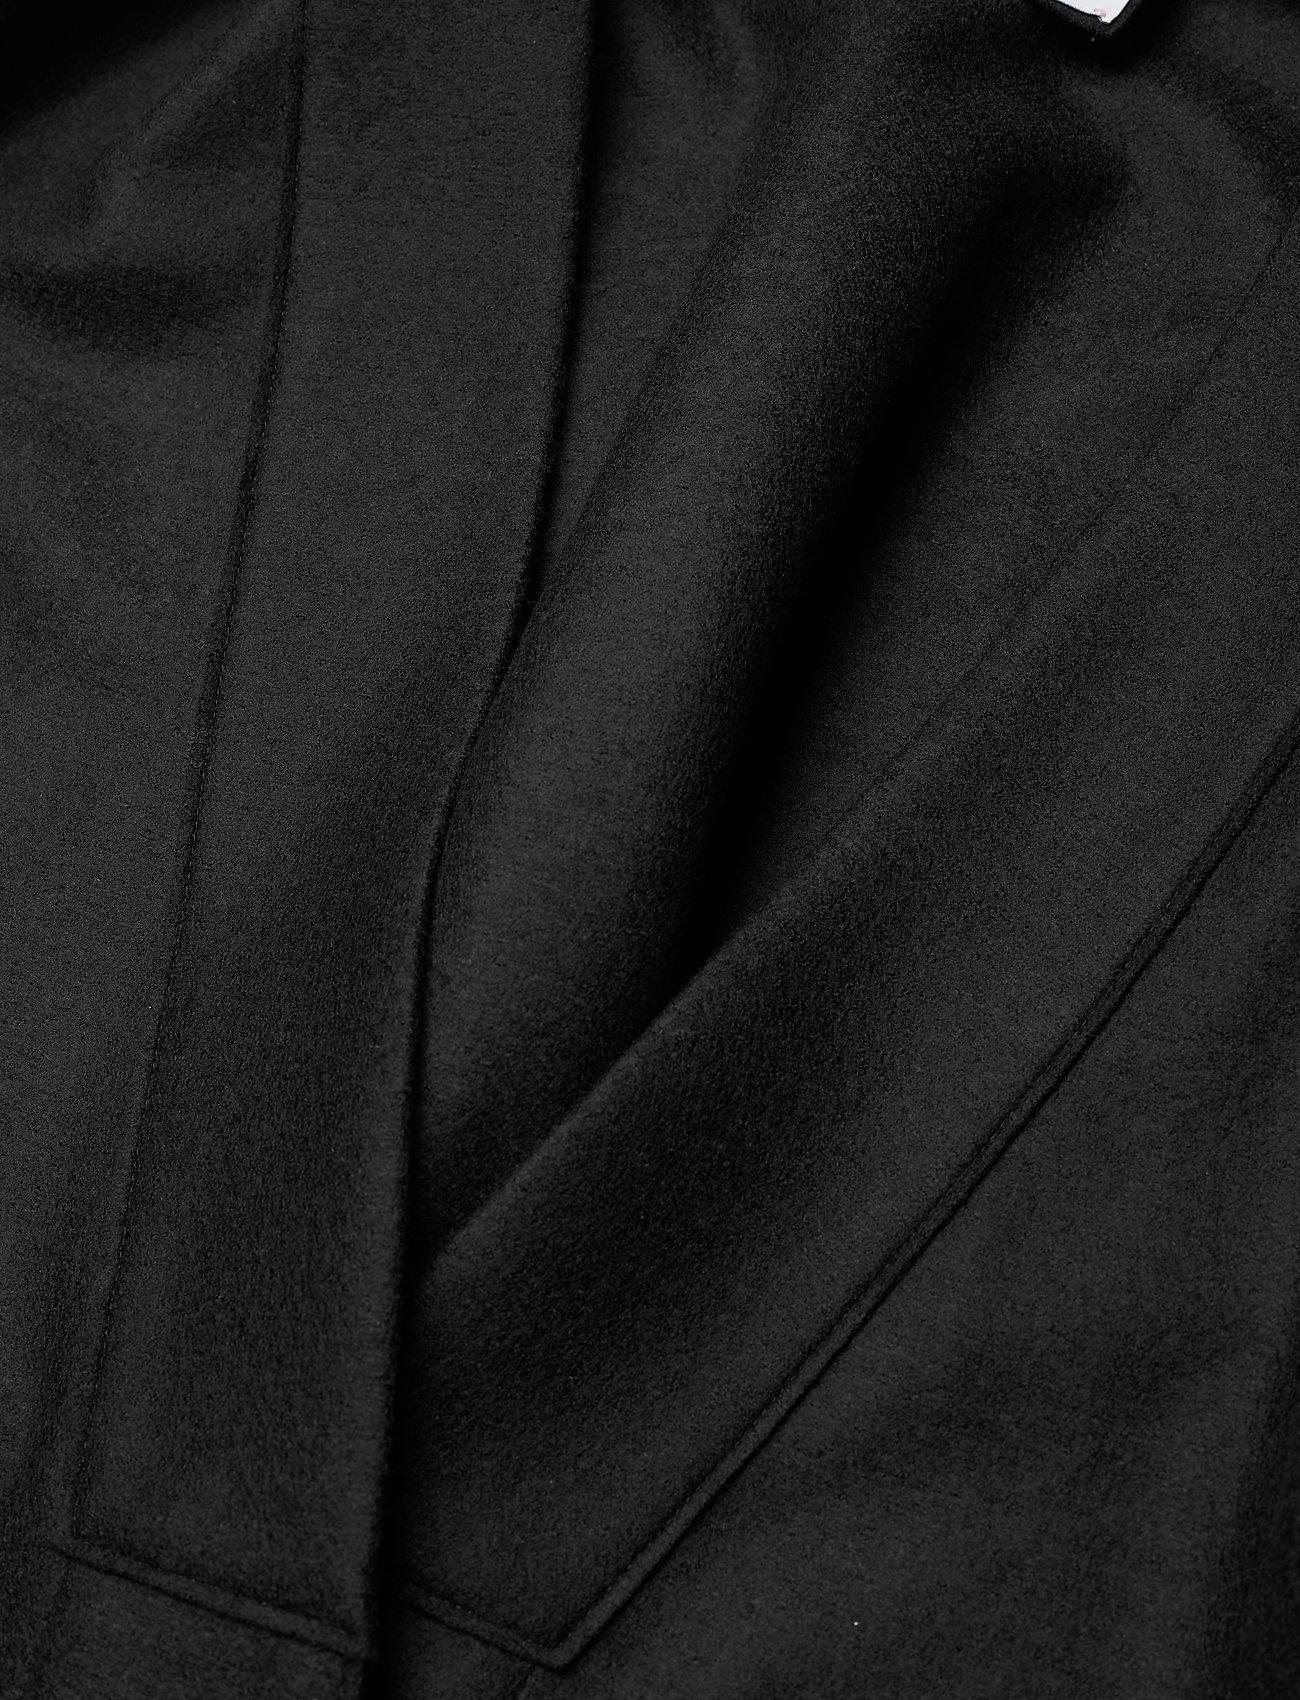 Harris Wharf London - Women Kimono Coat With Vents Light Pressed Wool - wollmäntel - black - 2